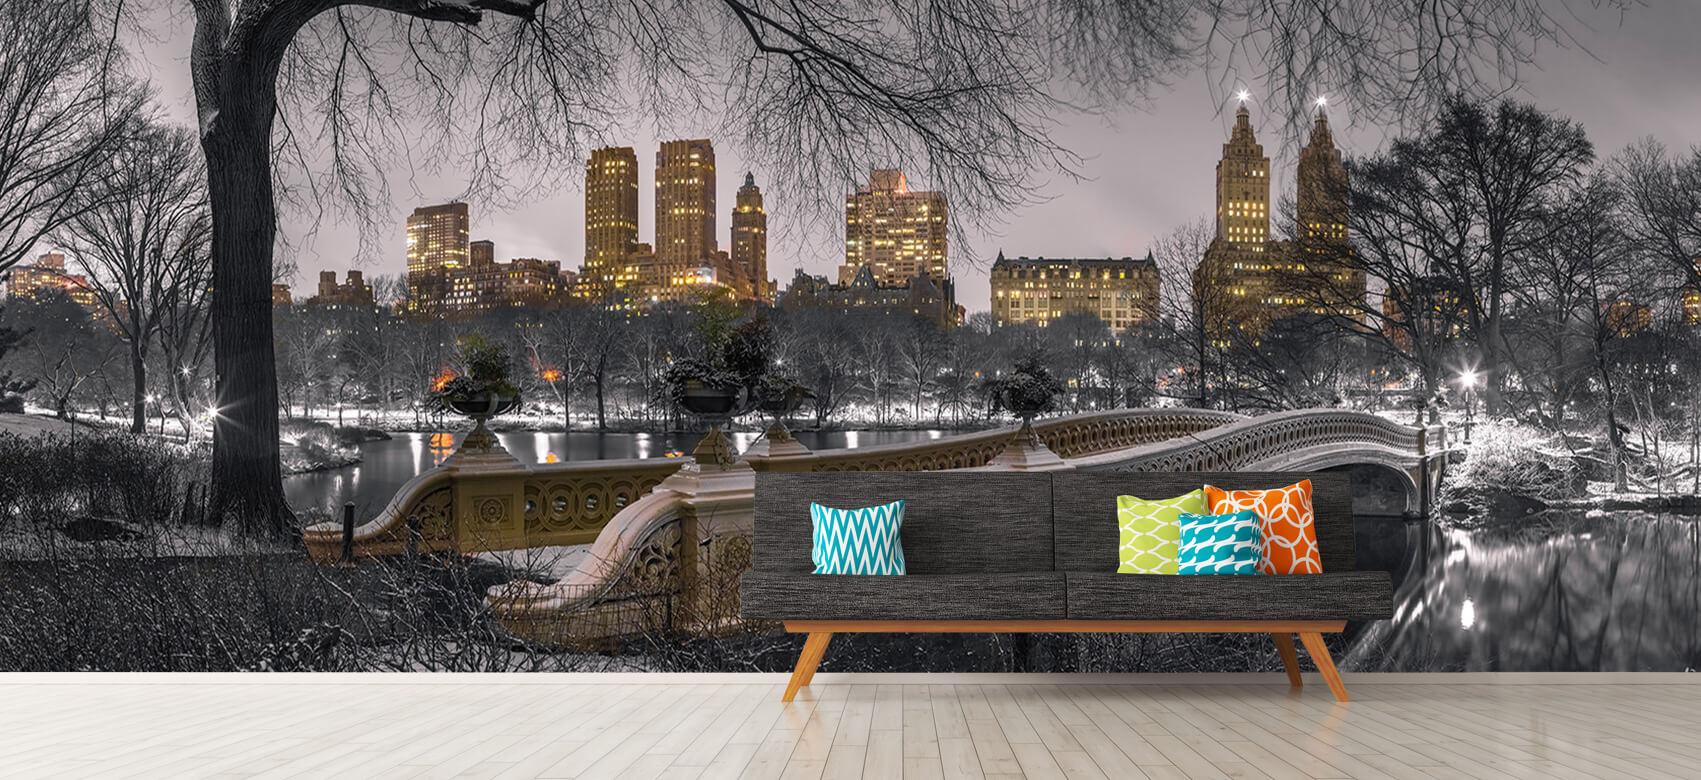 Central park and Manhattan 7